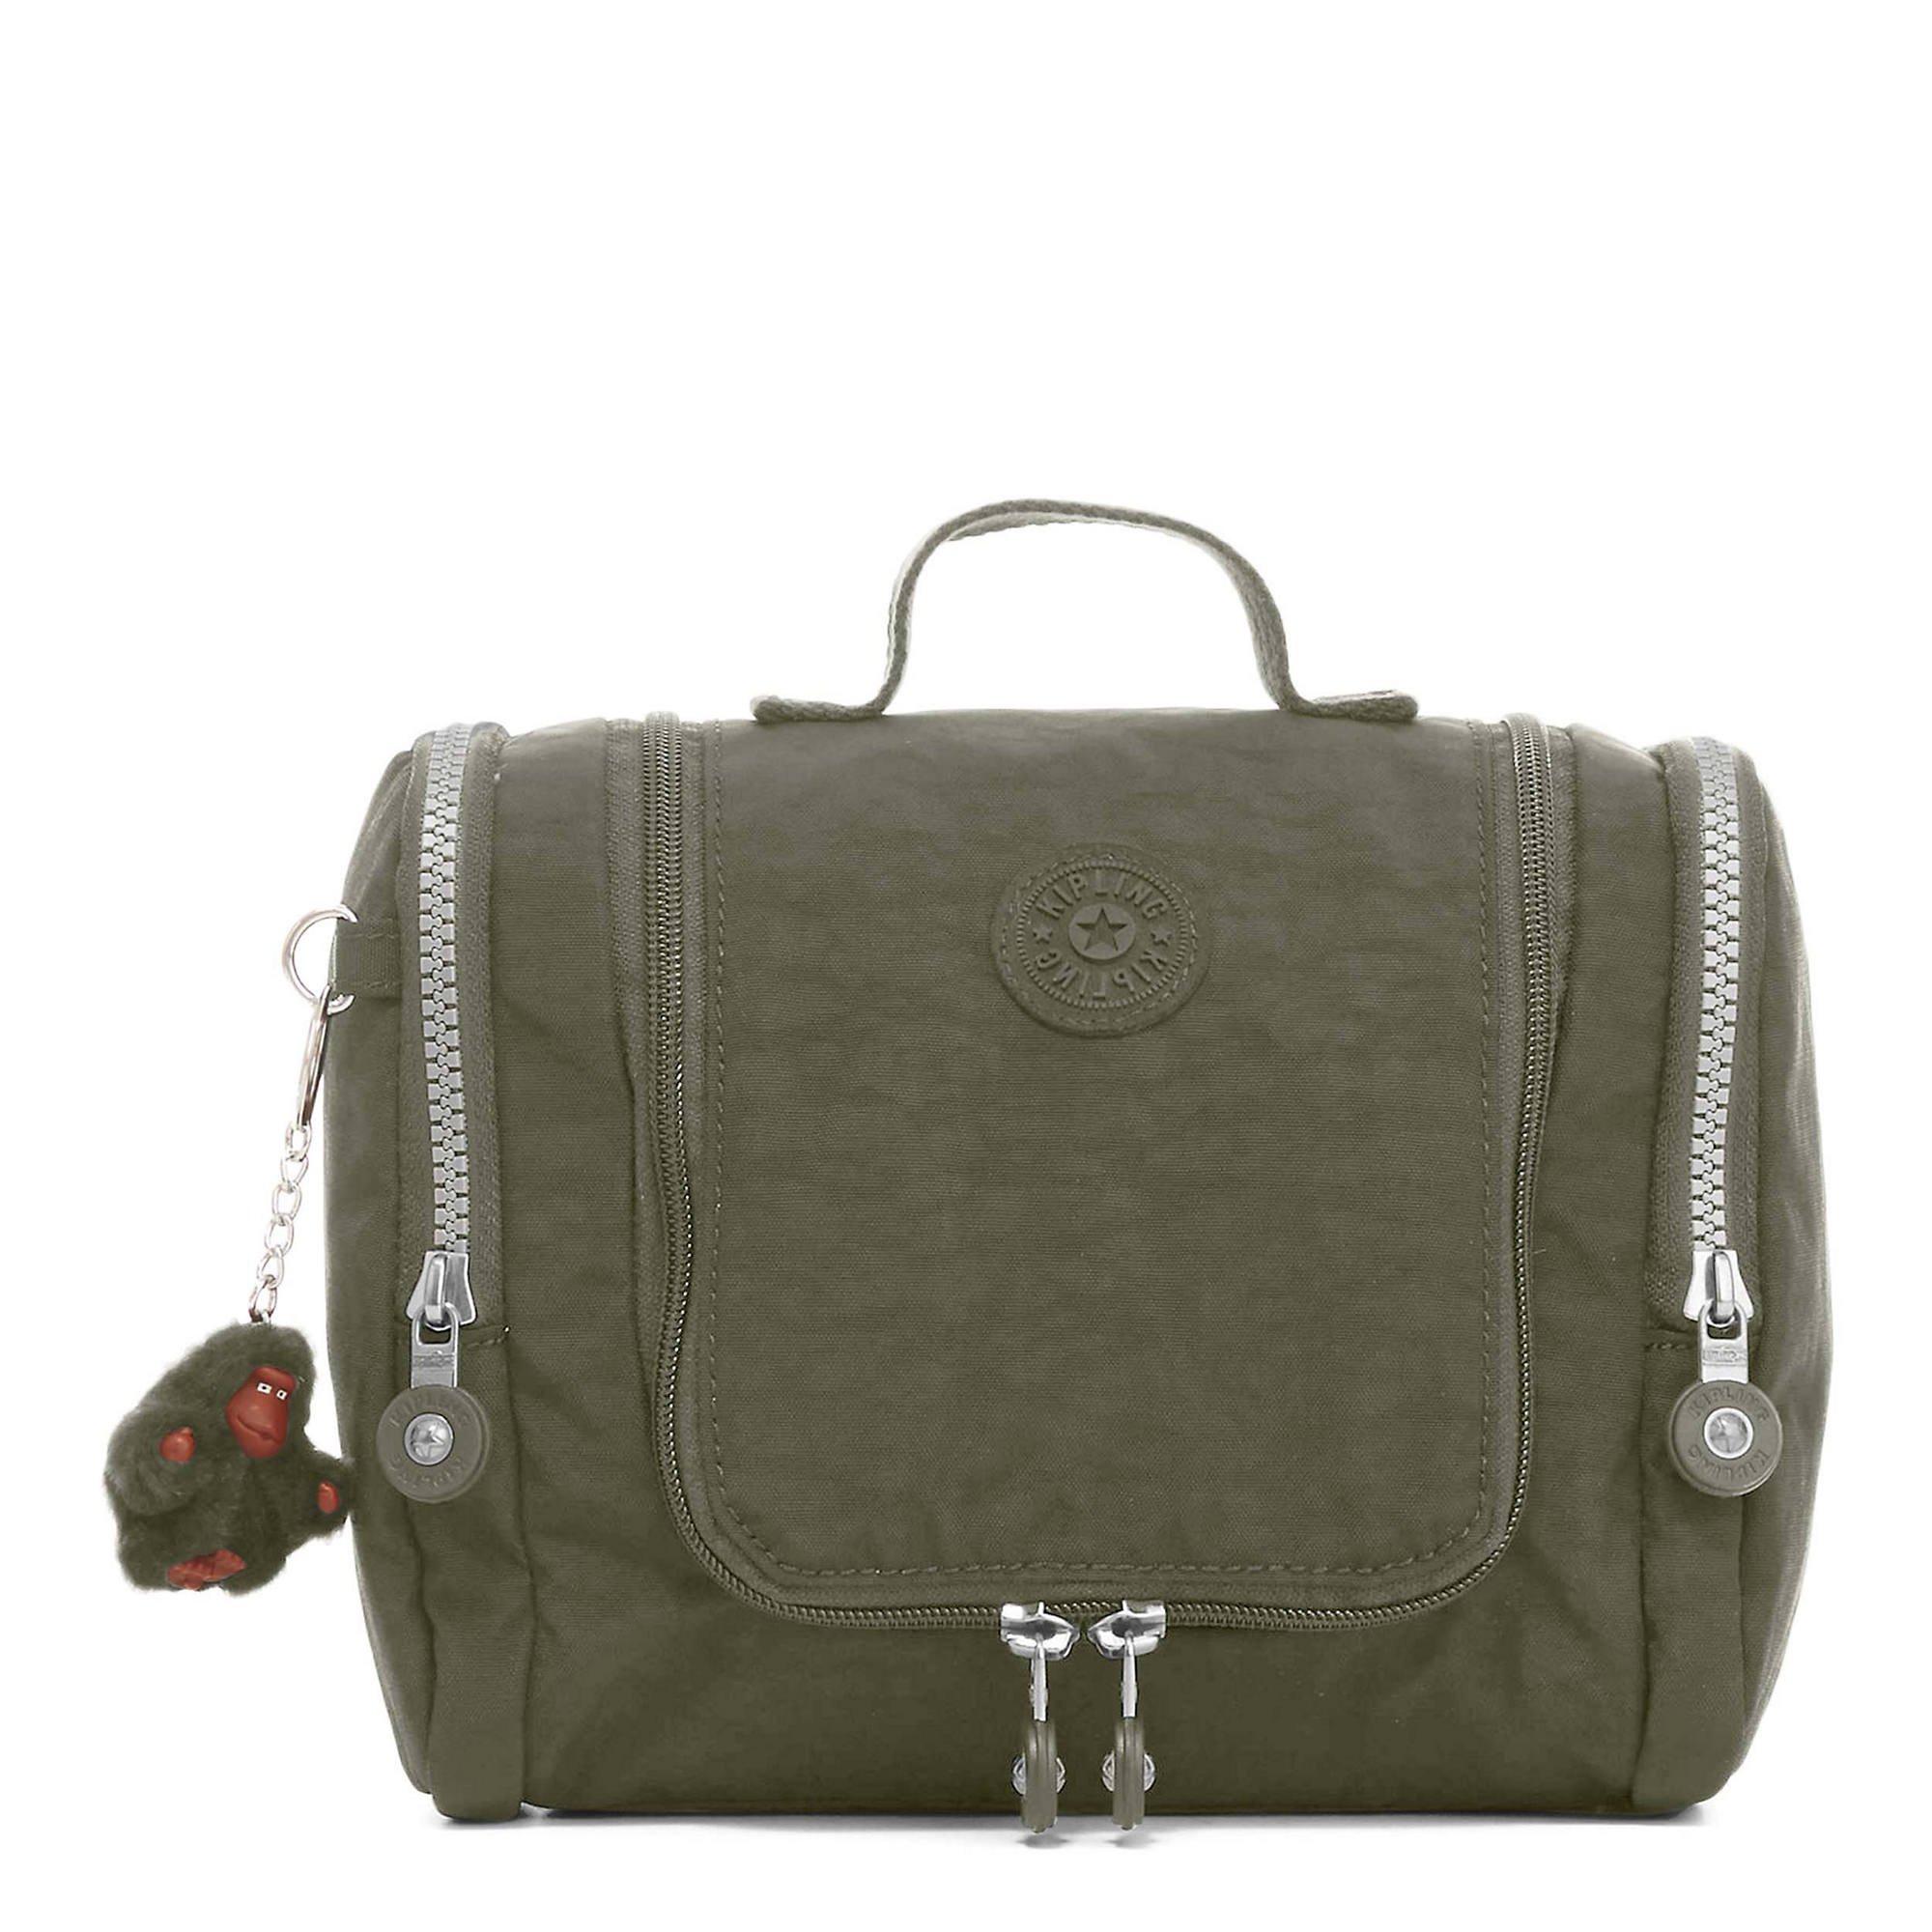 Kipling Connie Solid Hanging Toiletry Bag, Jaded Green